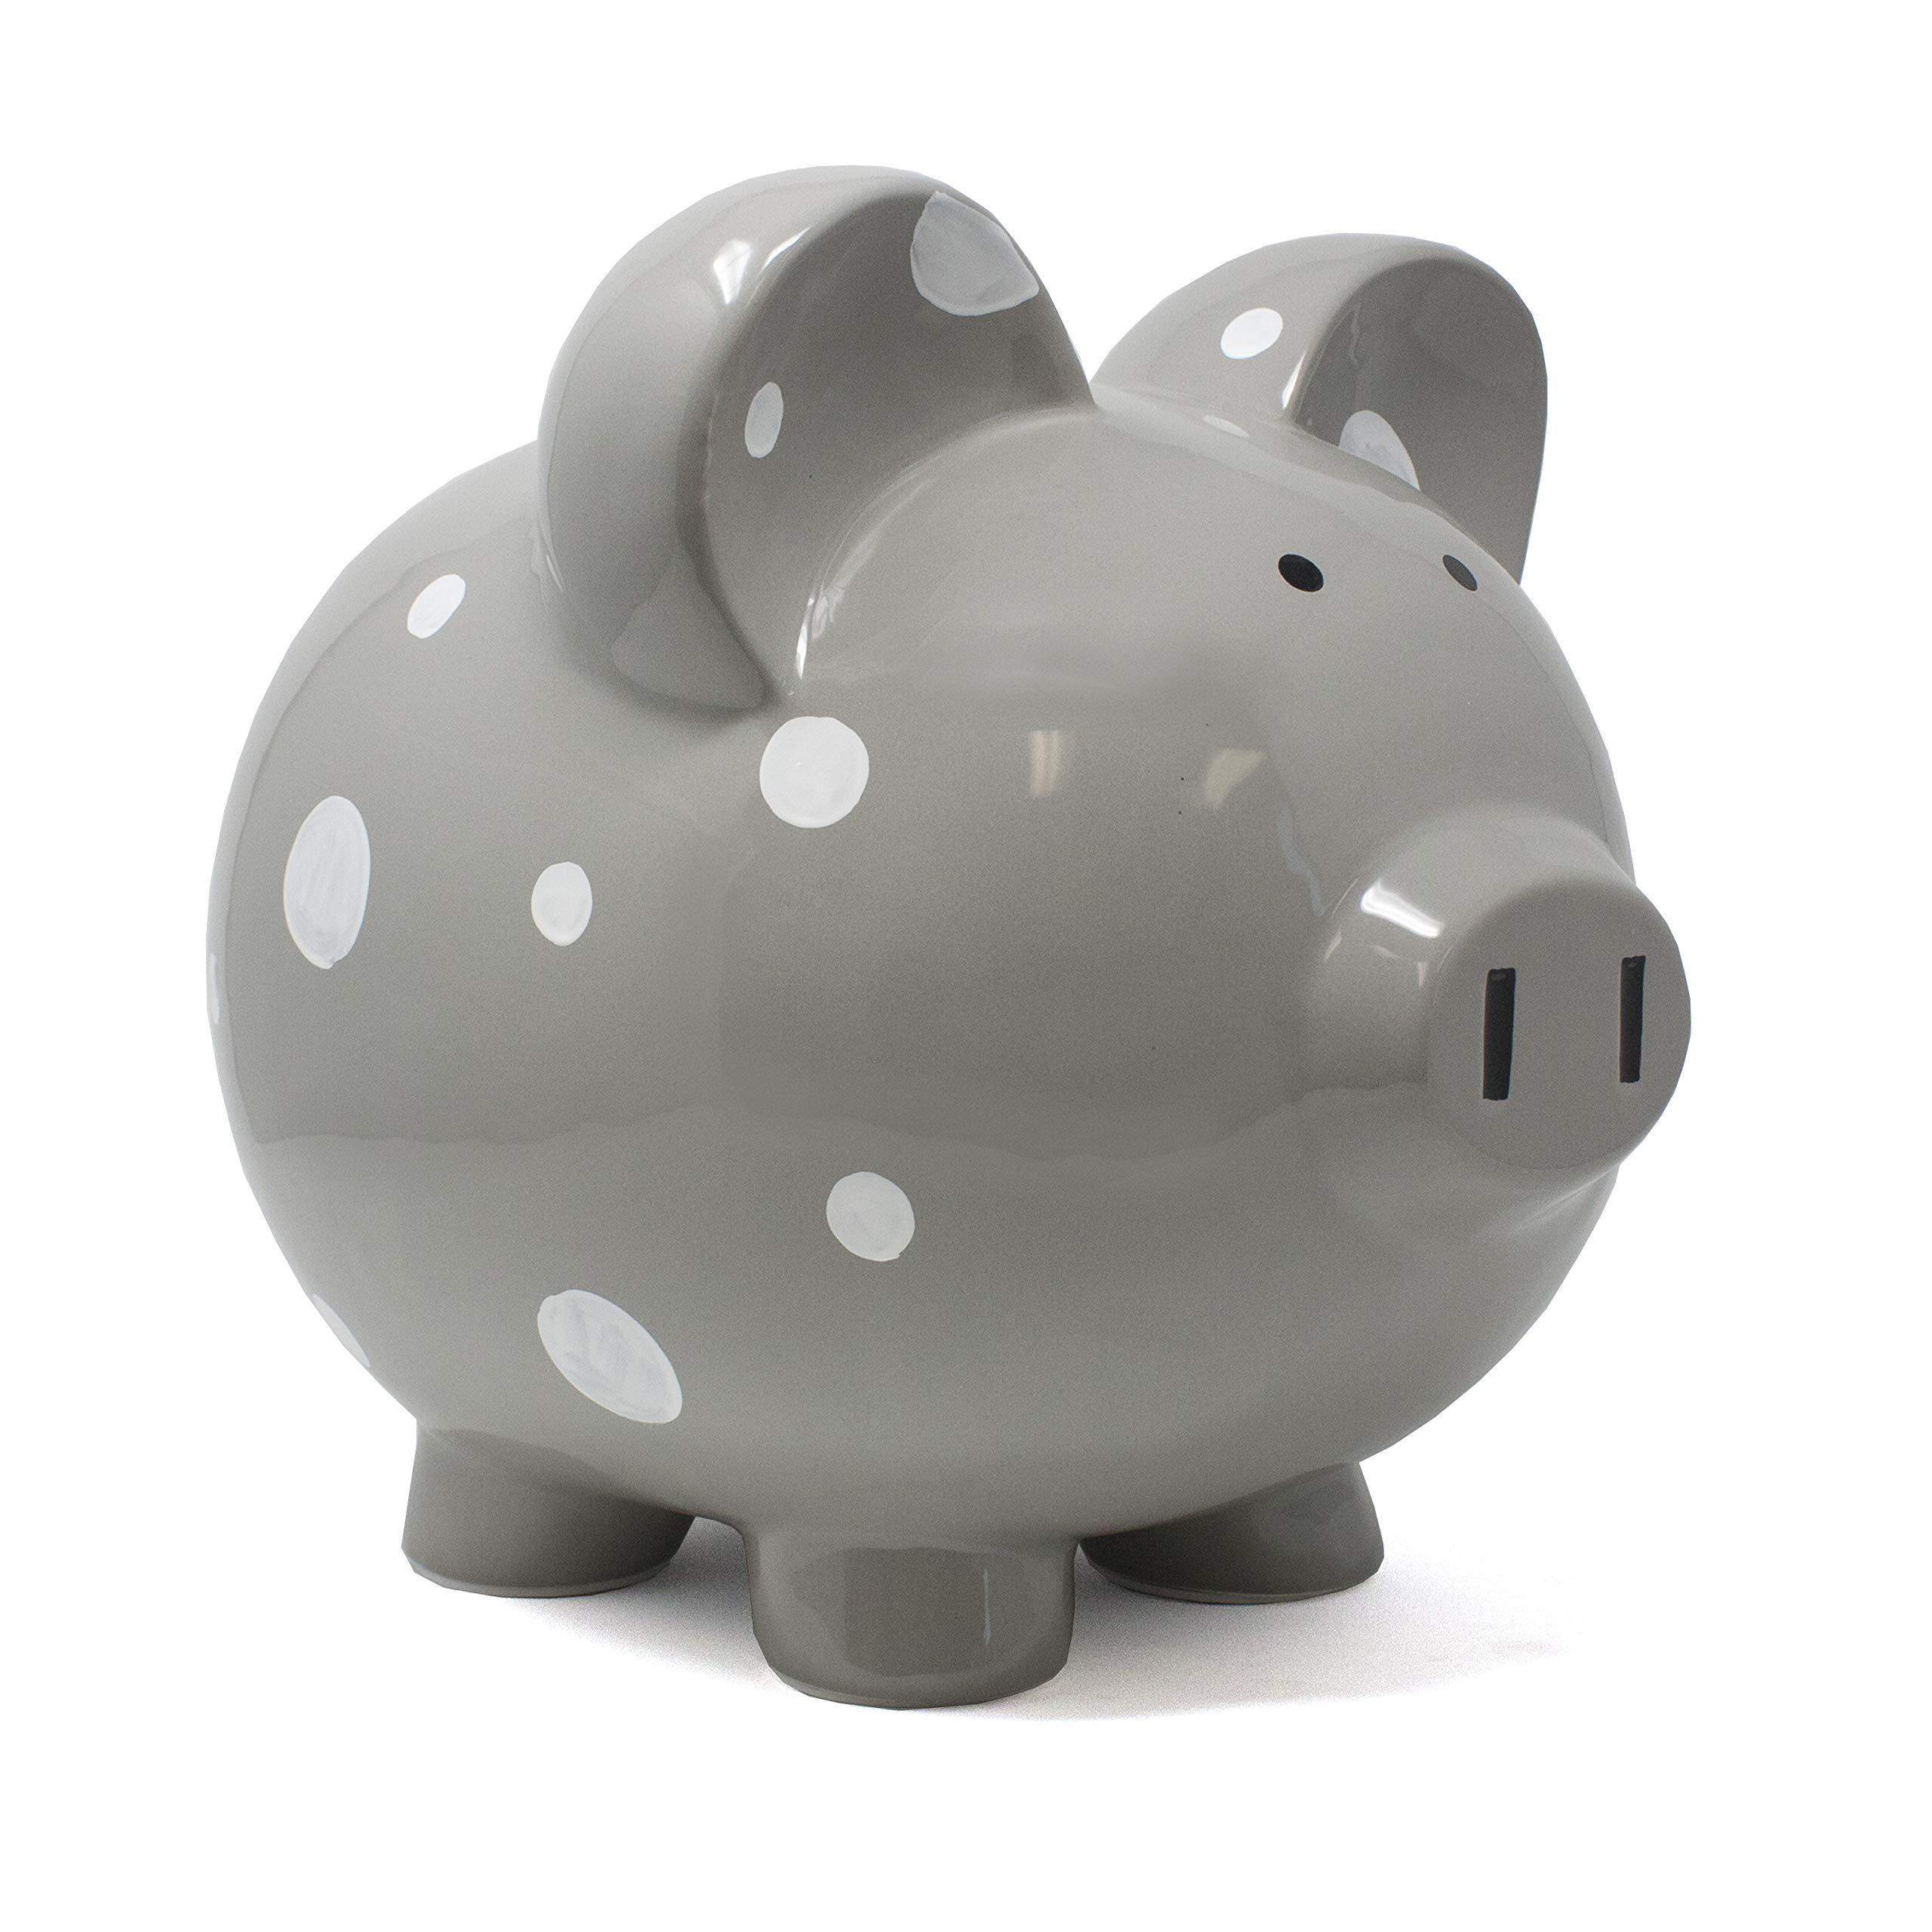 Child to Cherish Large Ceramic Boss Piggy Bank, Gray Polka Dot